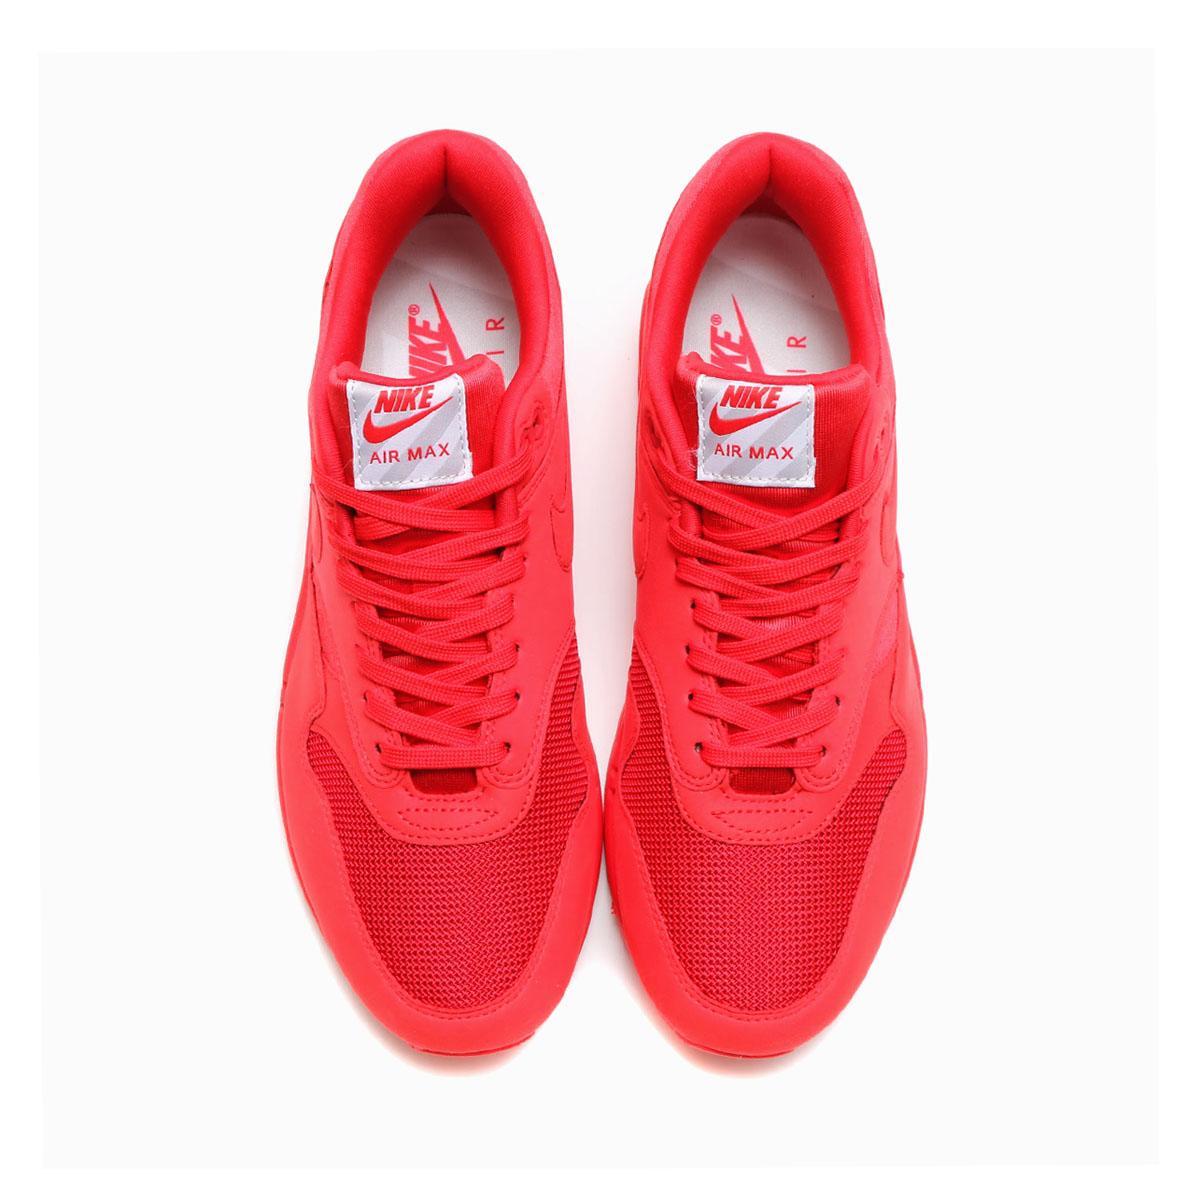 NIKE AIR MAX 1 PREMIUM (나이키 에어 막스 1 프리미엄) (UNIVERSITY RED/UNIVERSITY RED) 17 SU-I